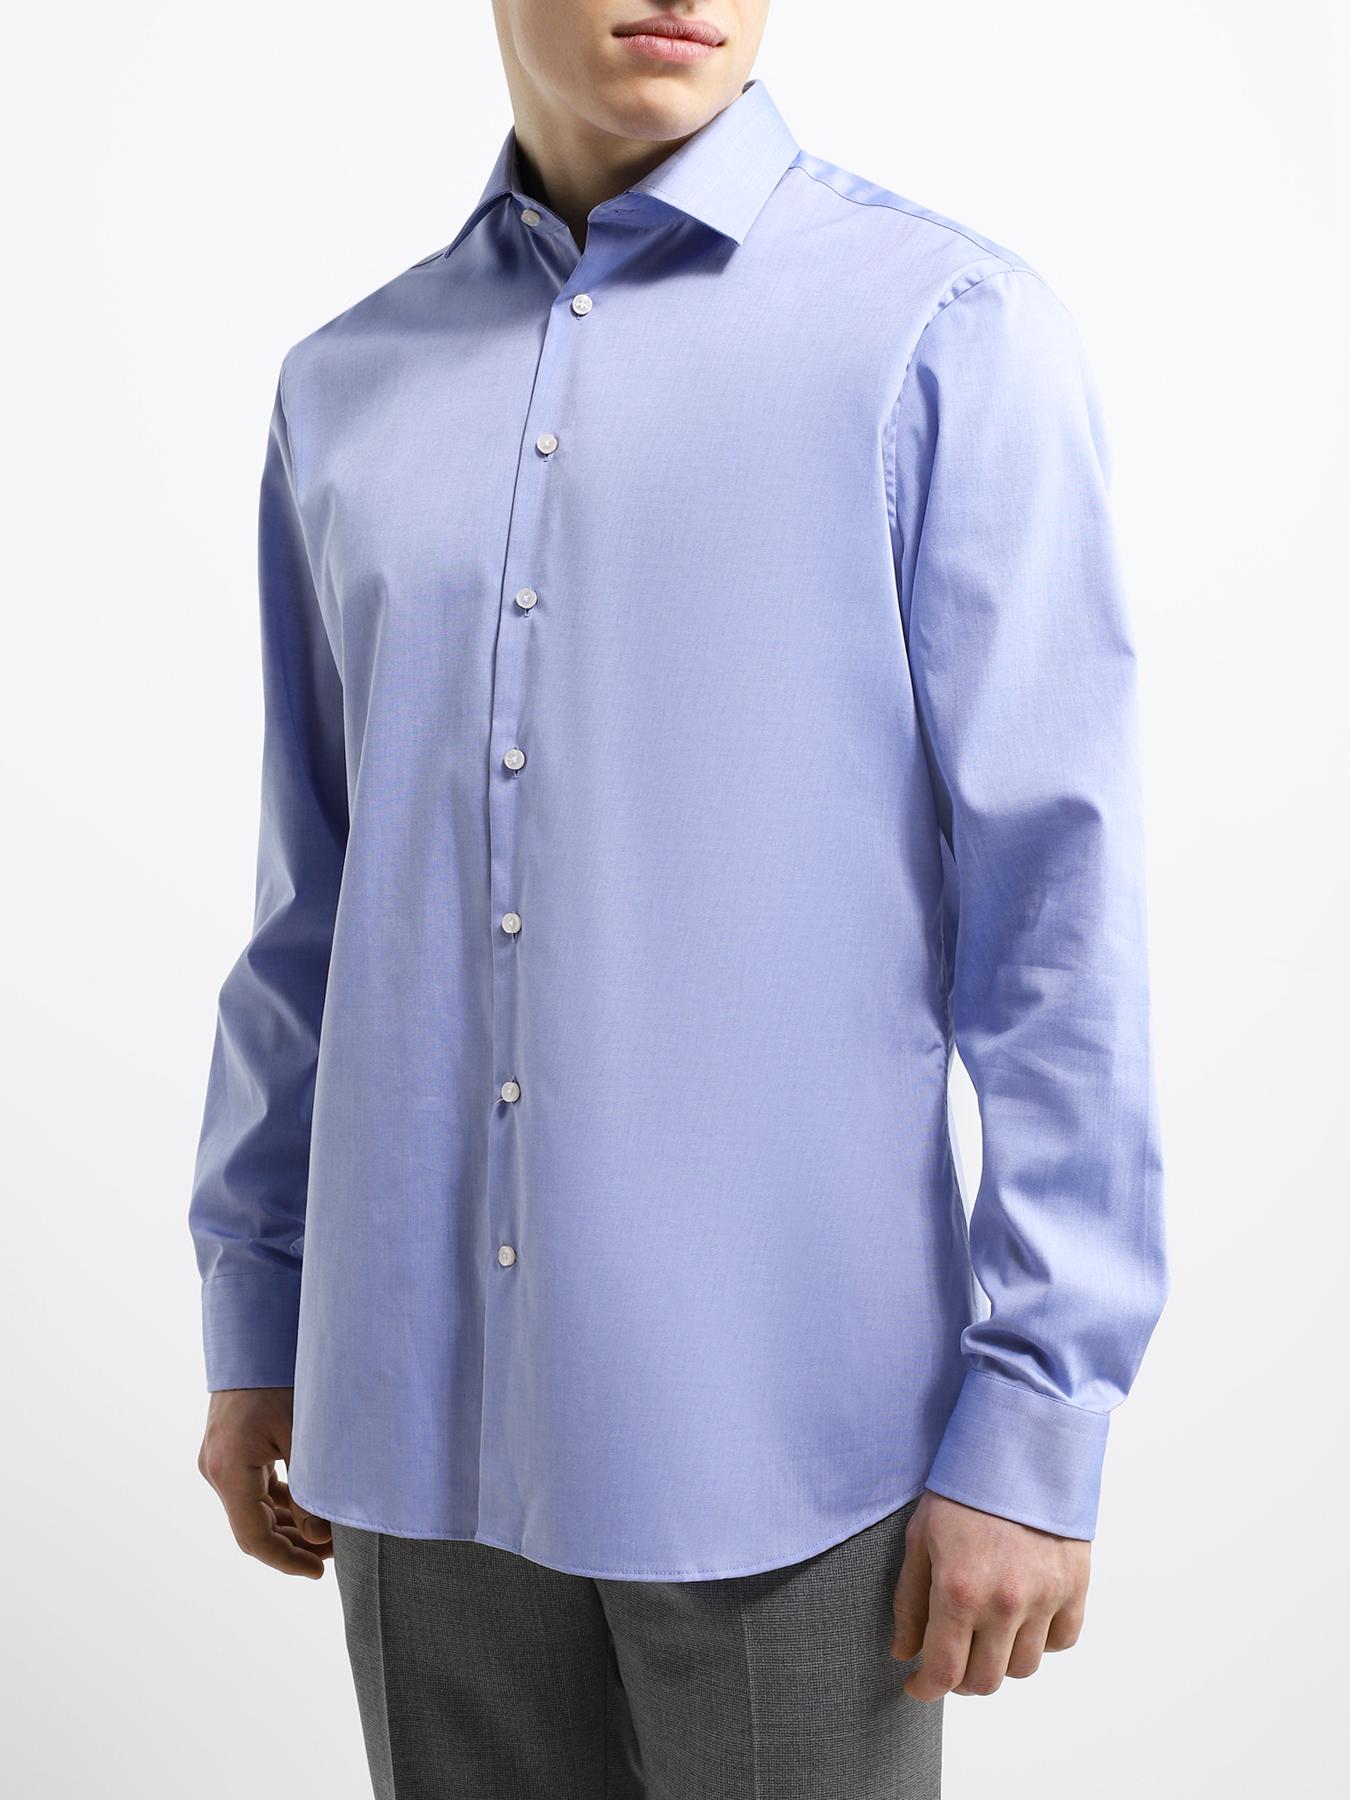 Рубашки Seidensticker Мужская рубашка рубашка мужская ancient sharks y23412700 23412700